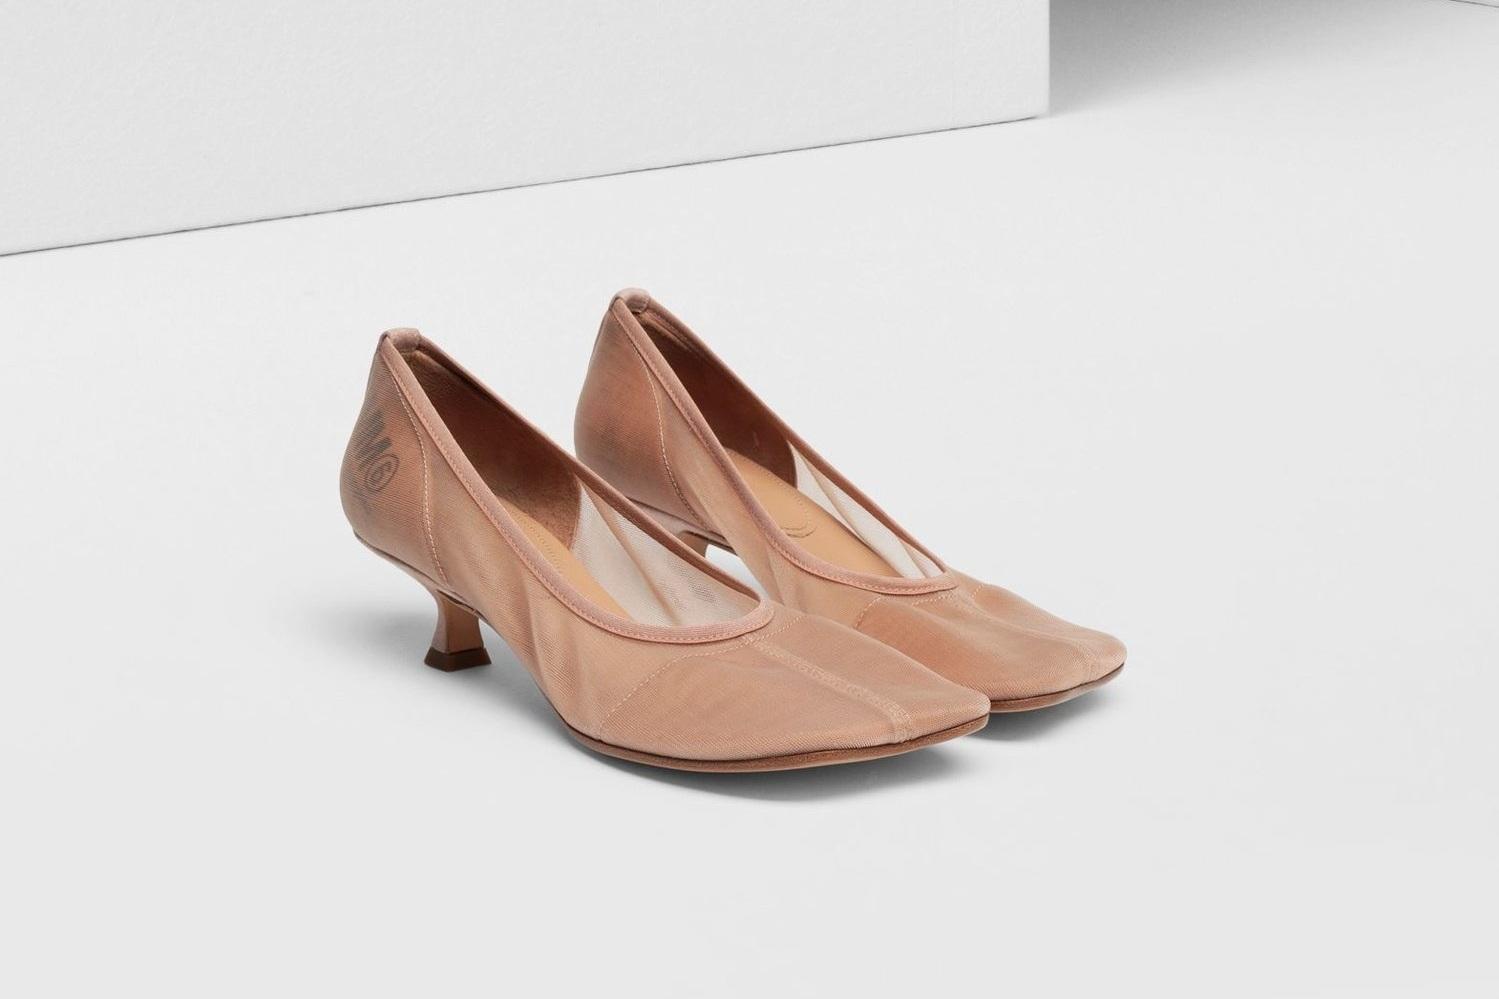 MM6 MAISON MARGIELA Mesh Kitten Heels (729) now $395